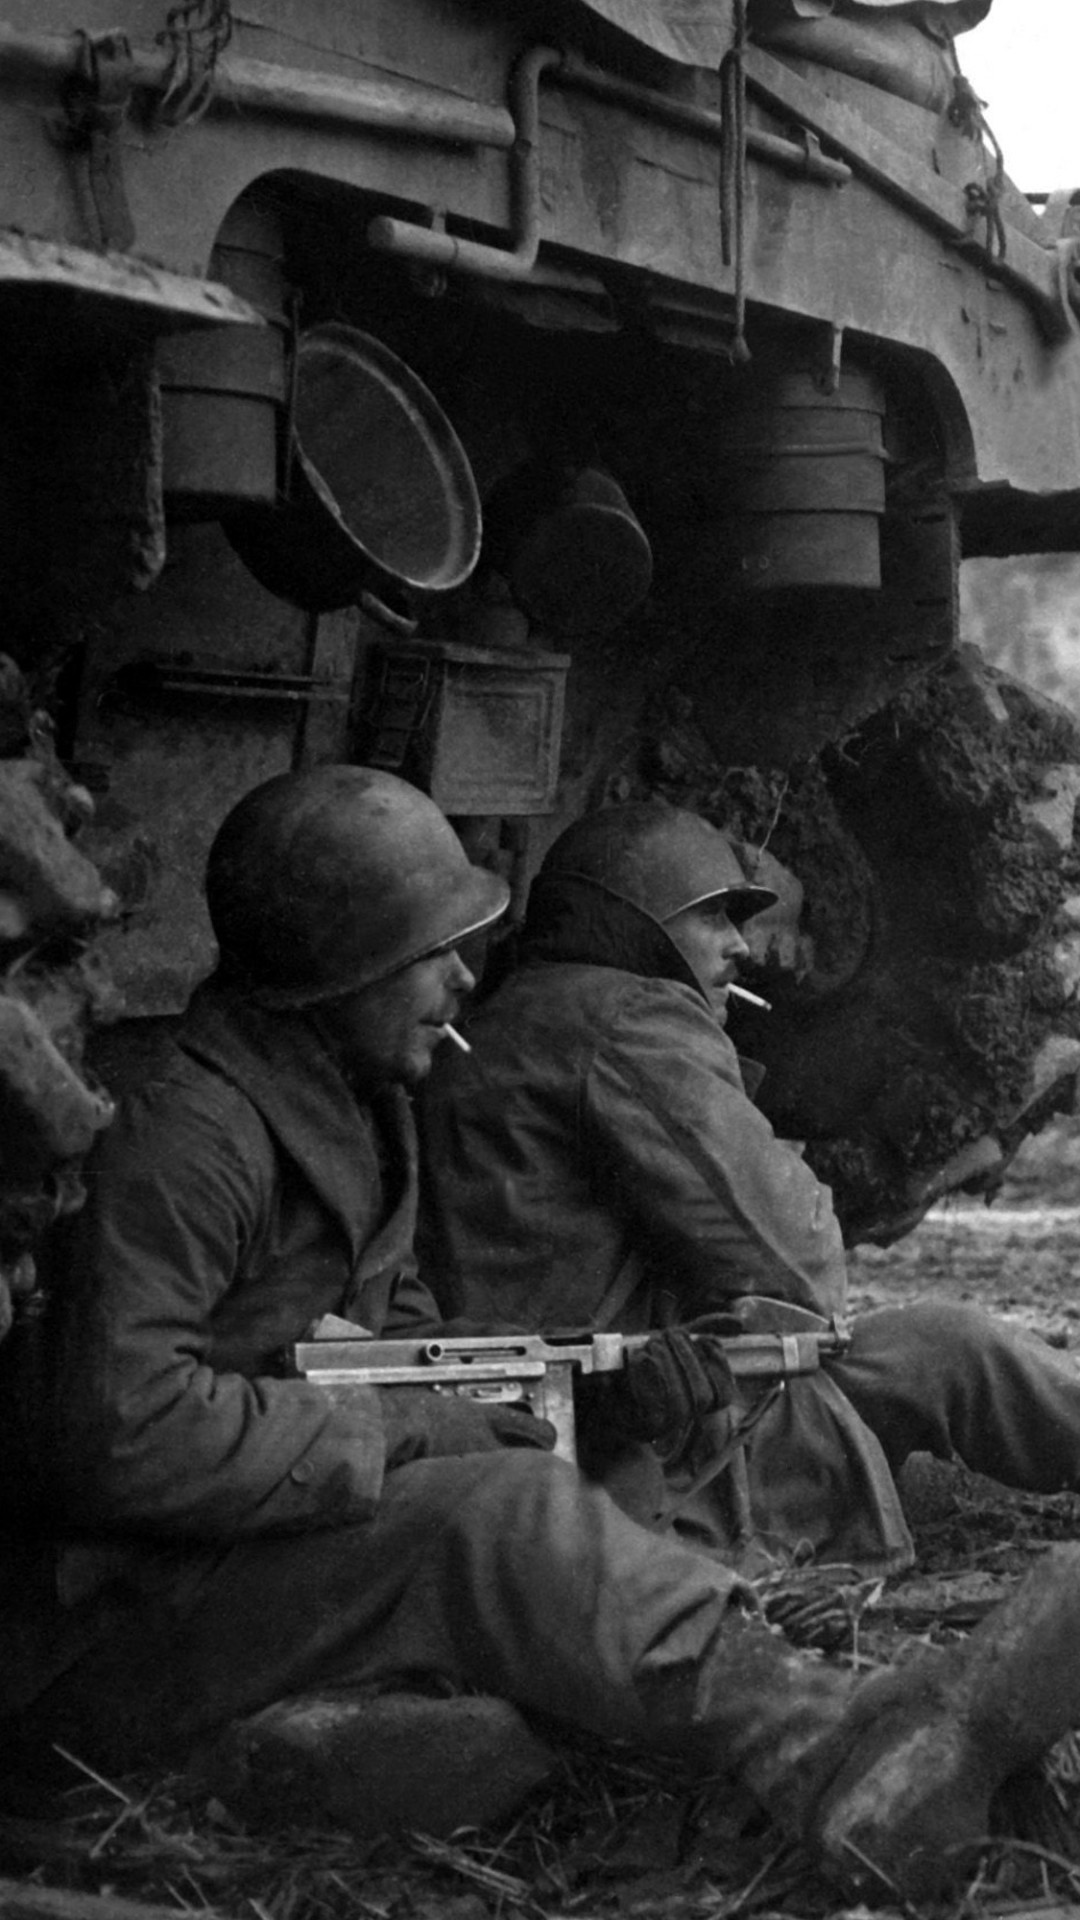 World War 2 Wallpapers 72 Background Pictures 1080x1920 Download Hd Wallpaper Wallpapertip